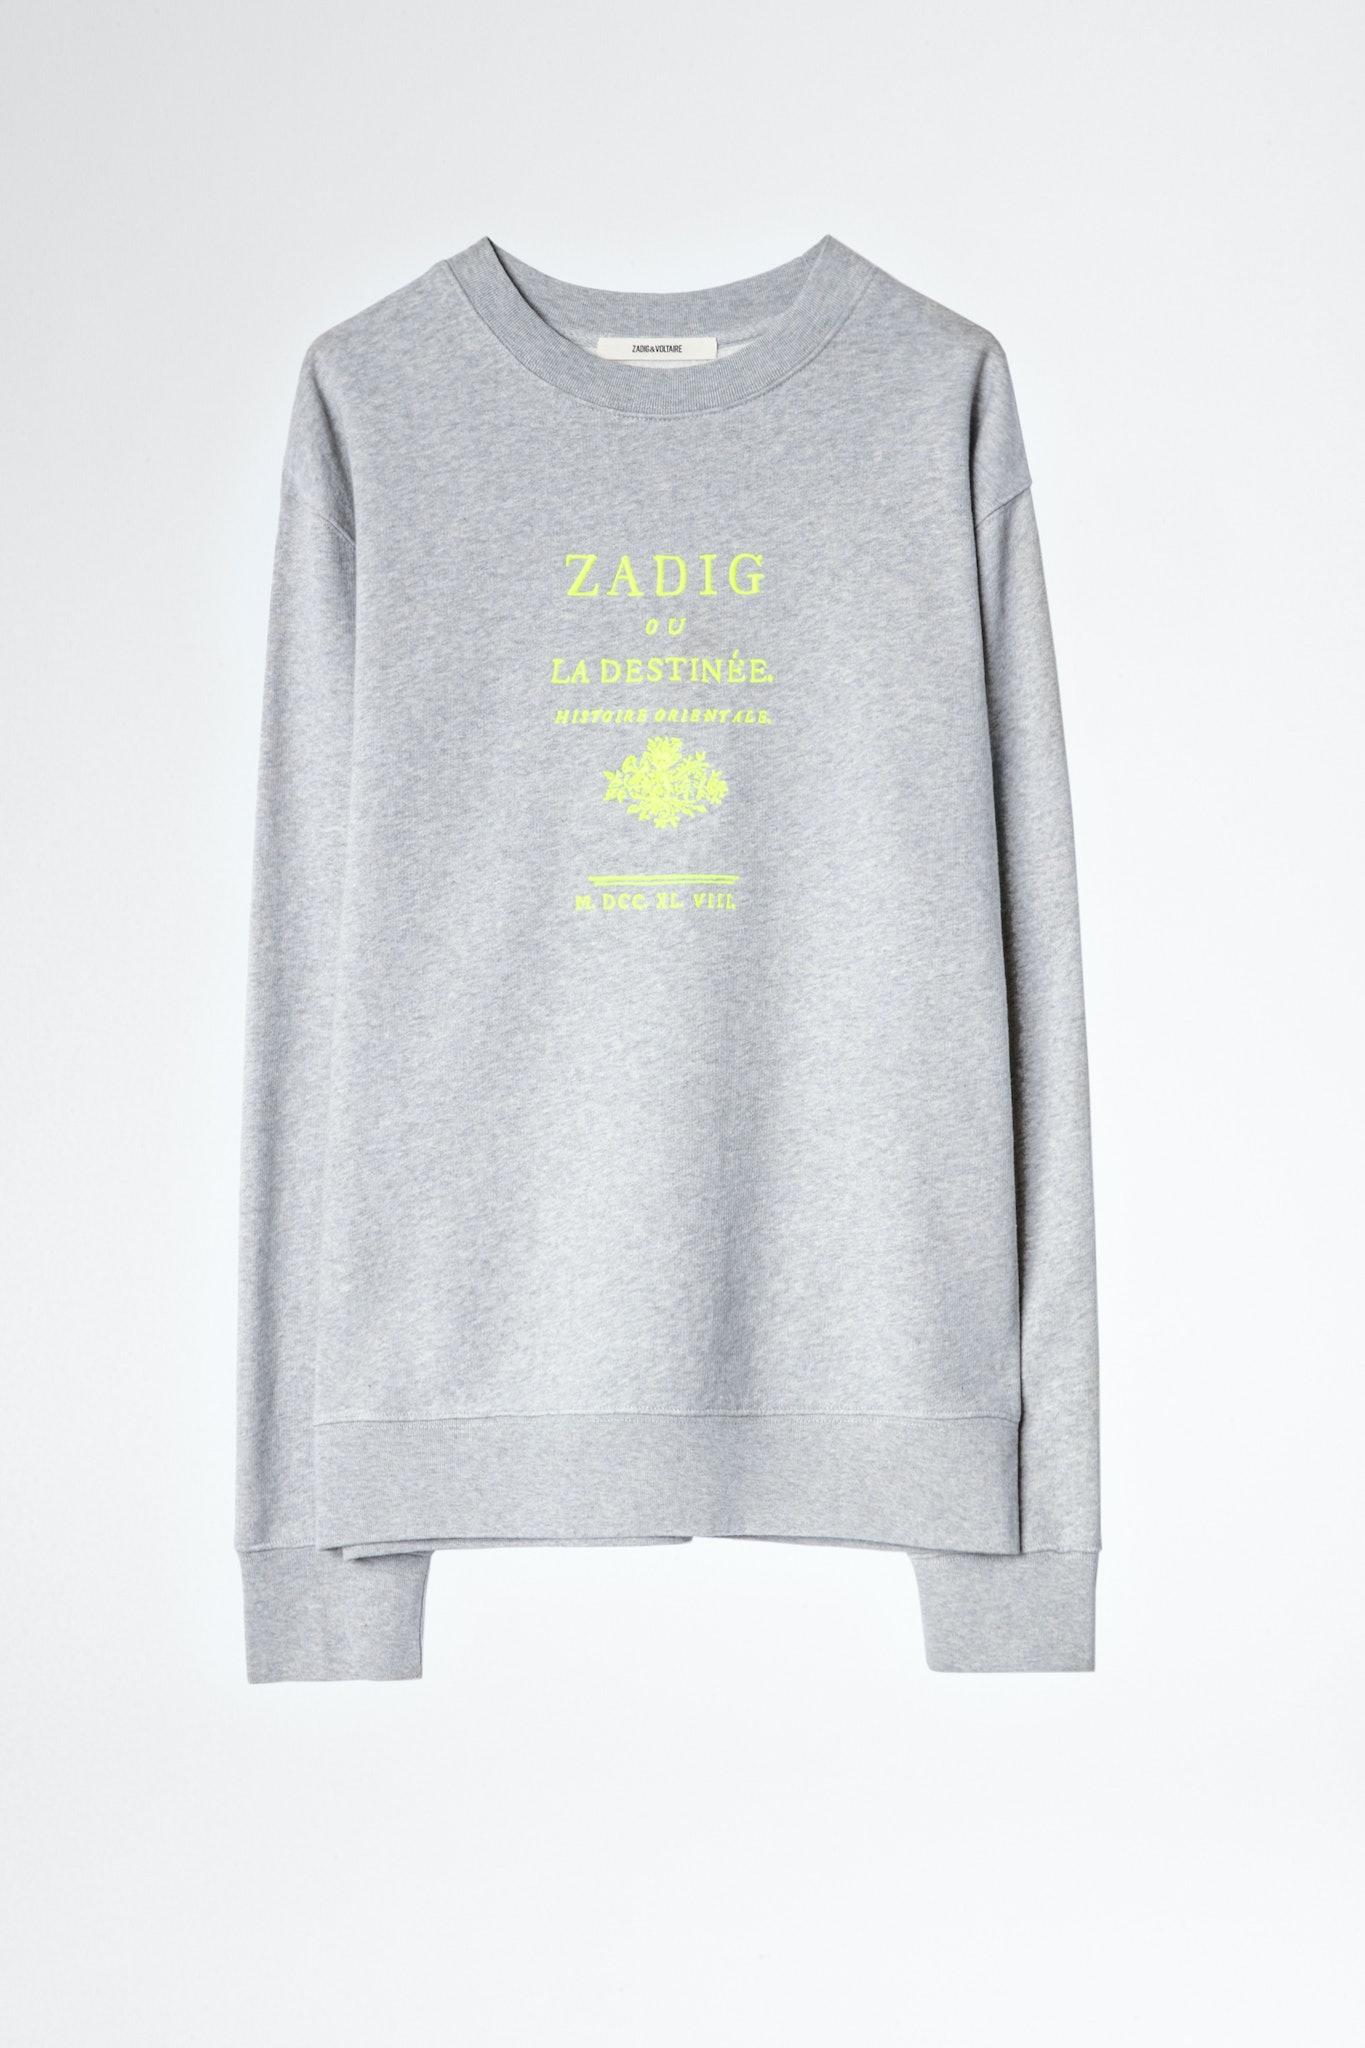 Simba Zadig Ou La Destinée Sweatshirt